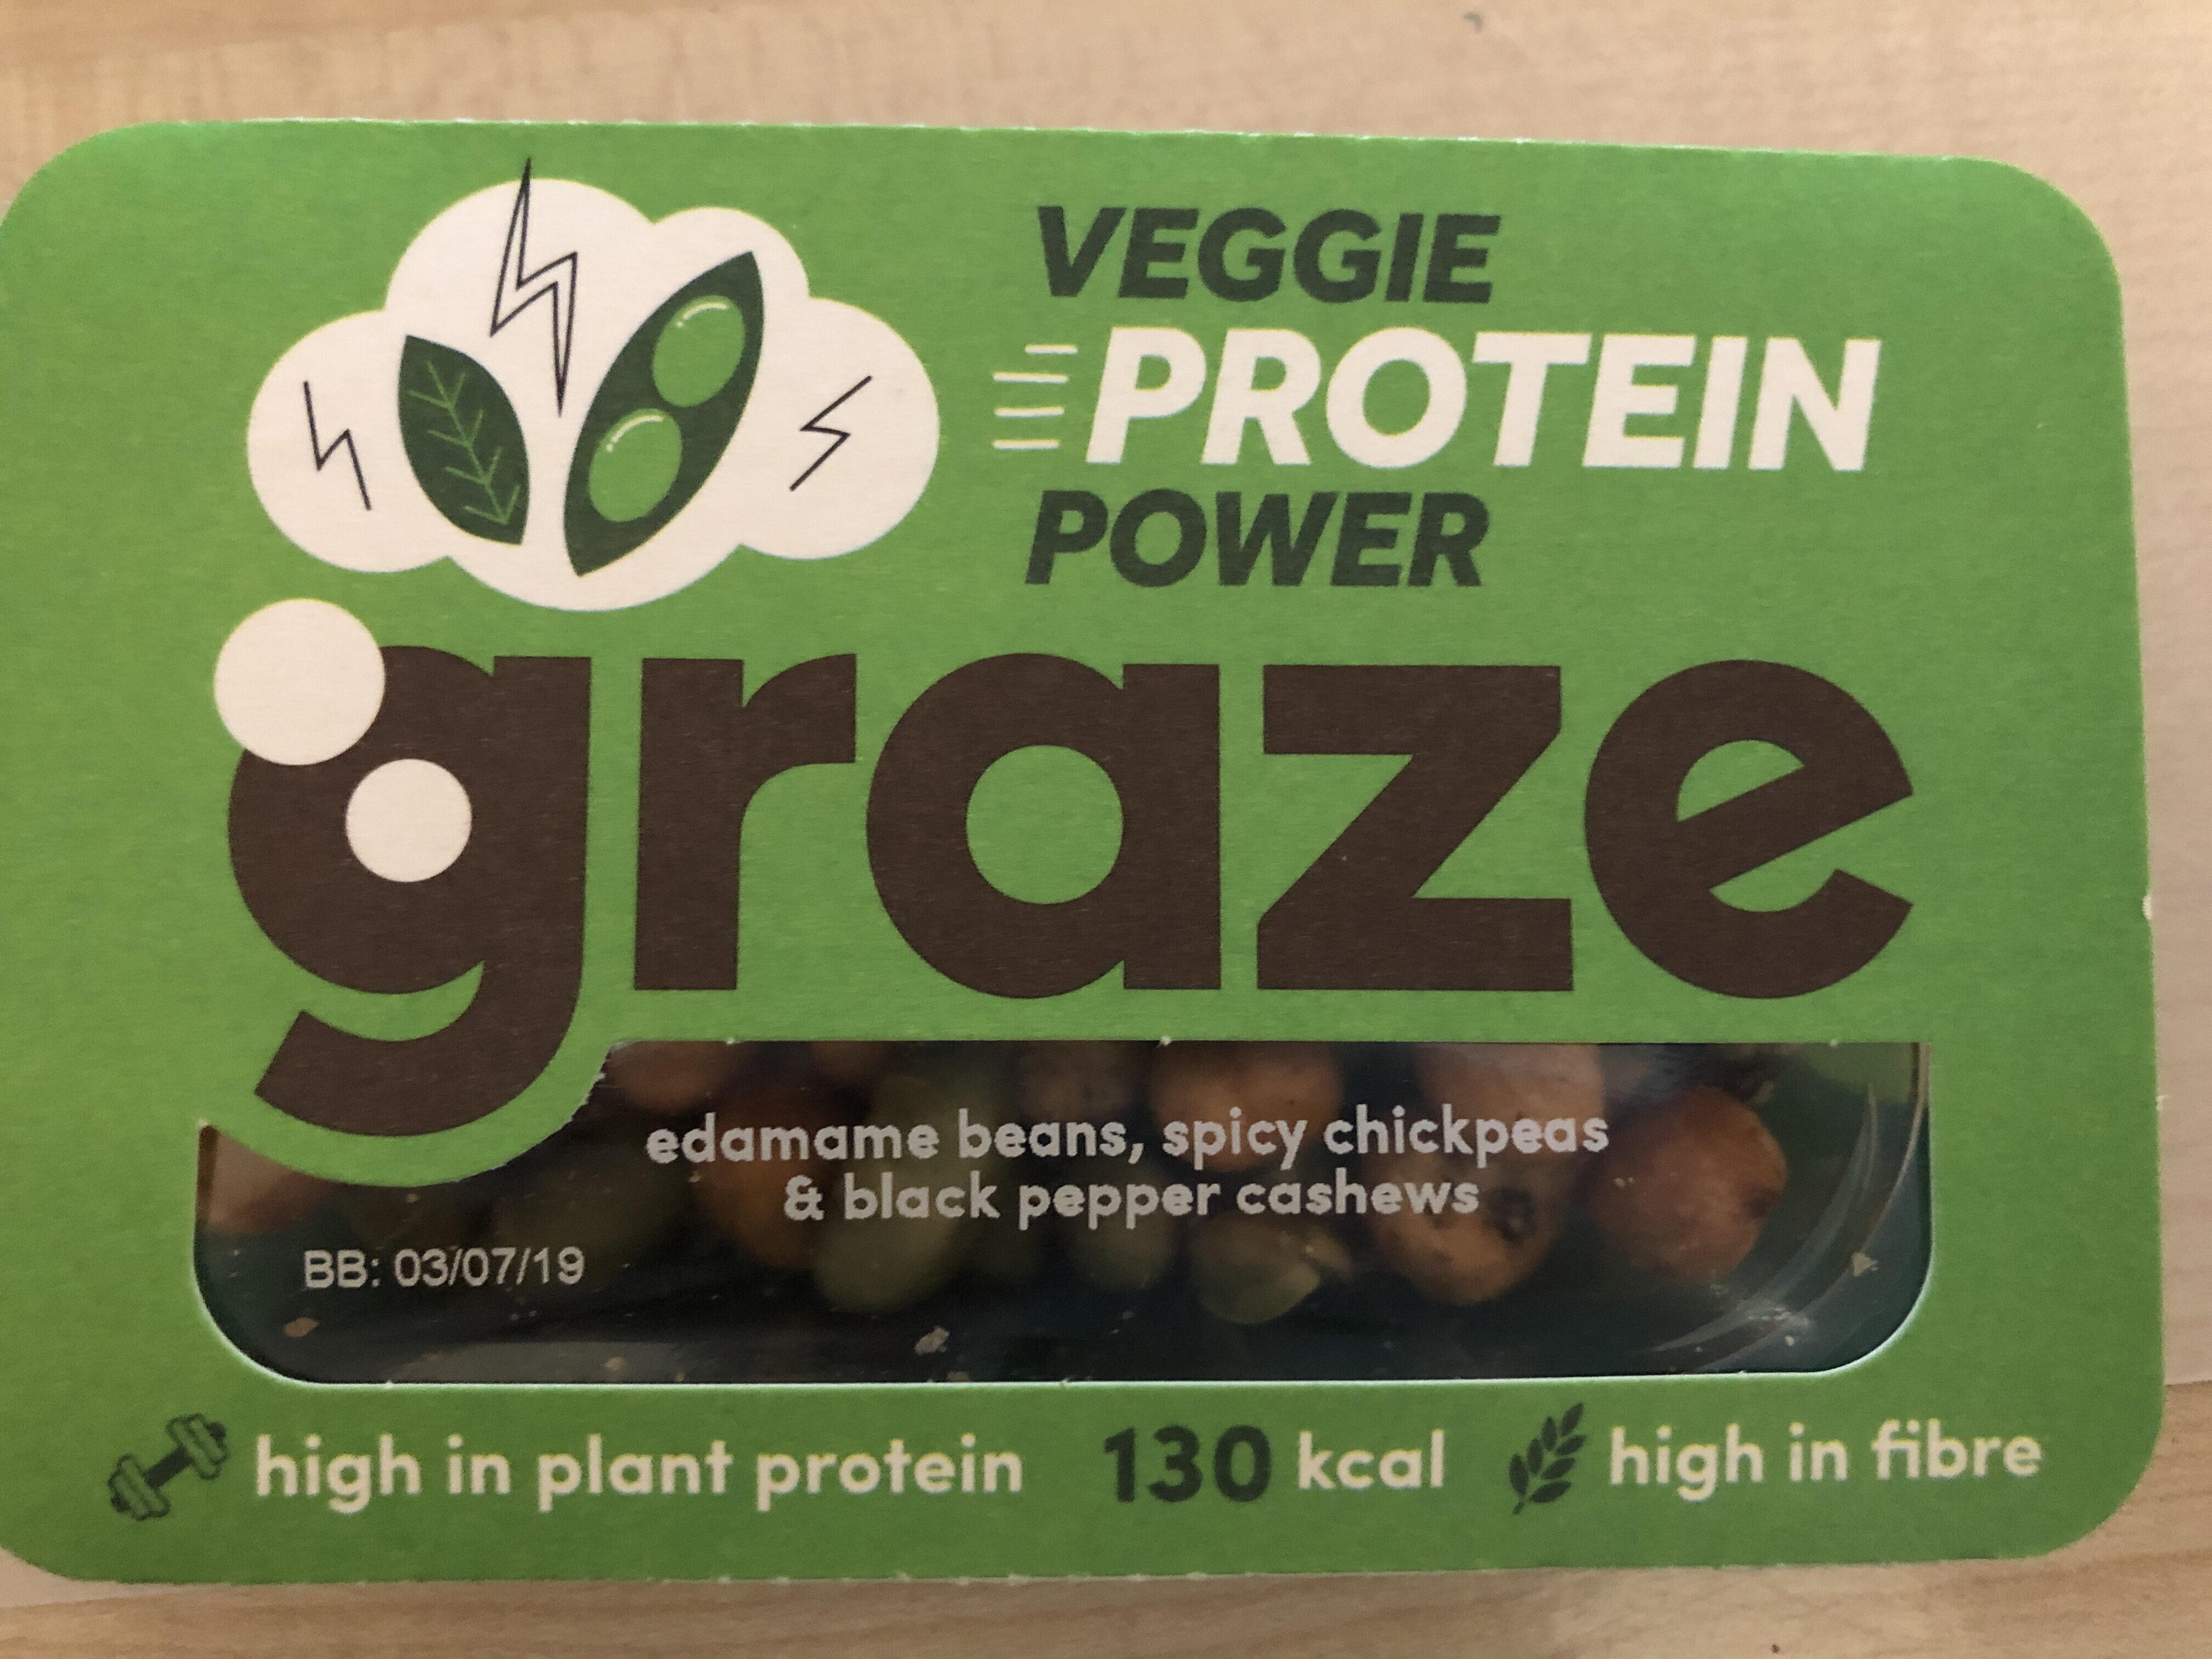 Graze Snack Box Veggie Protein Power - Product - en